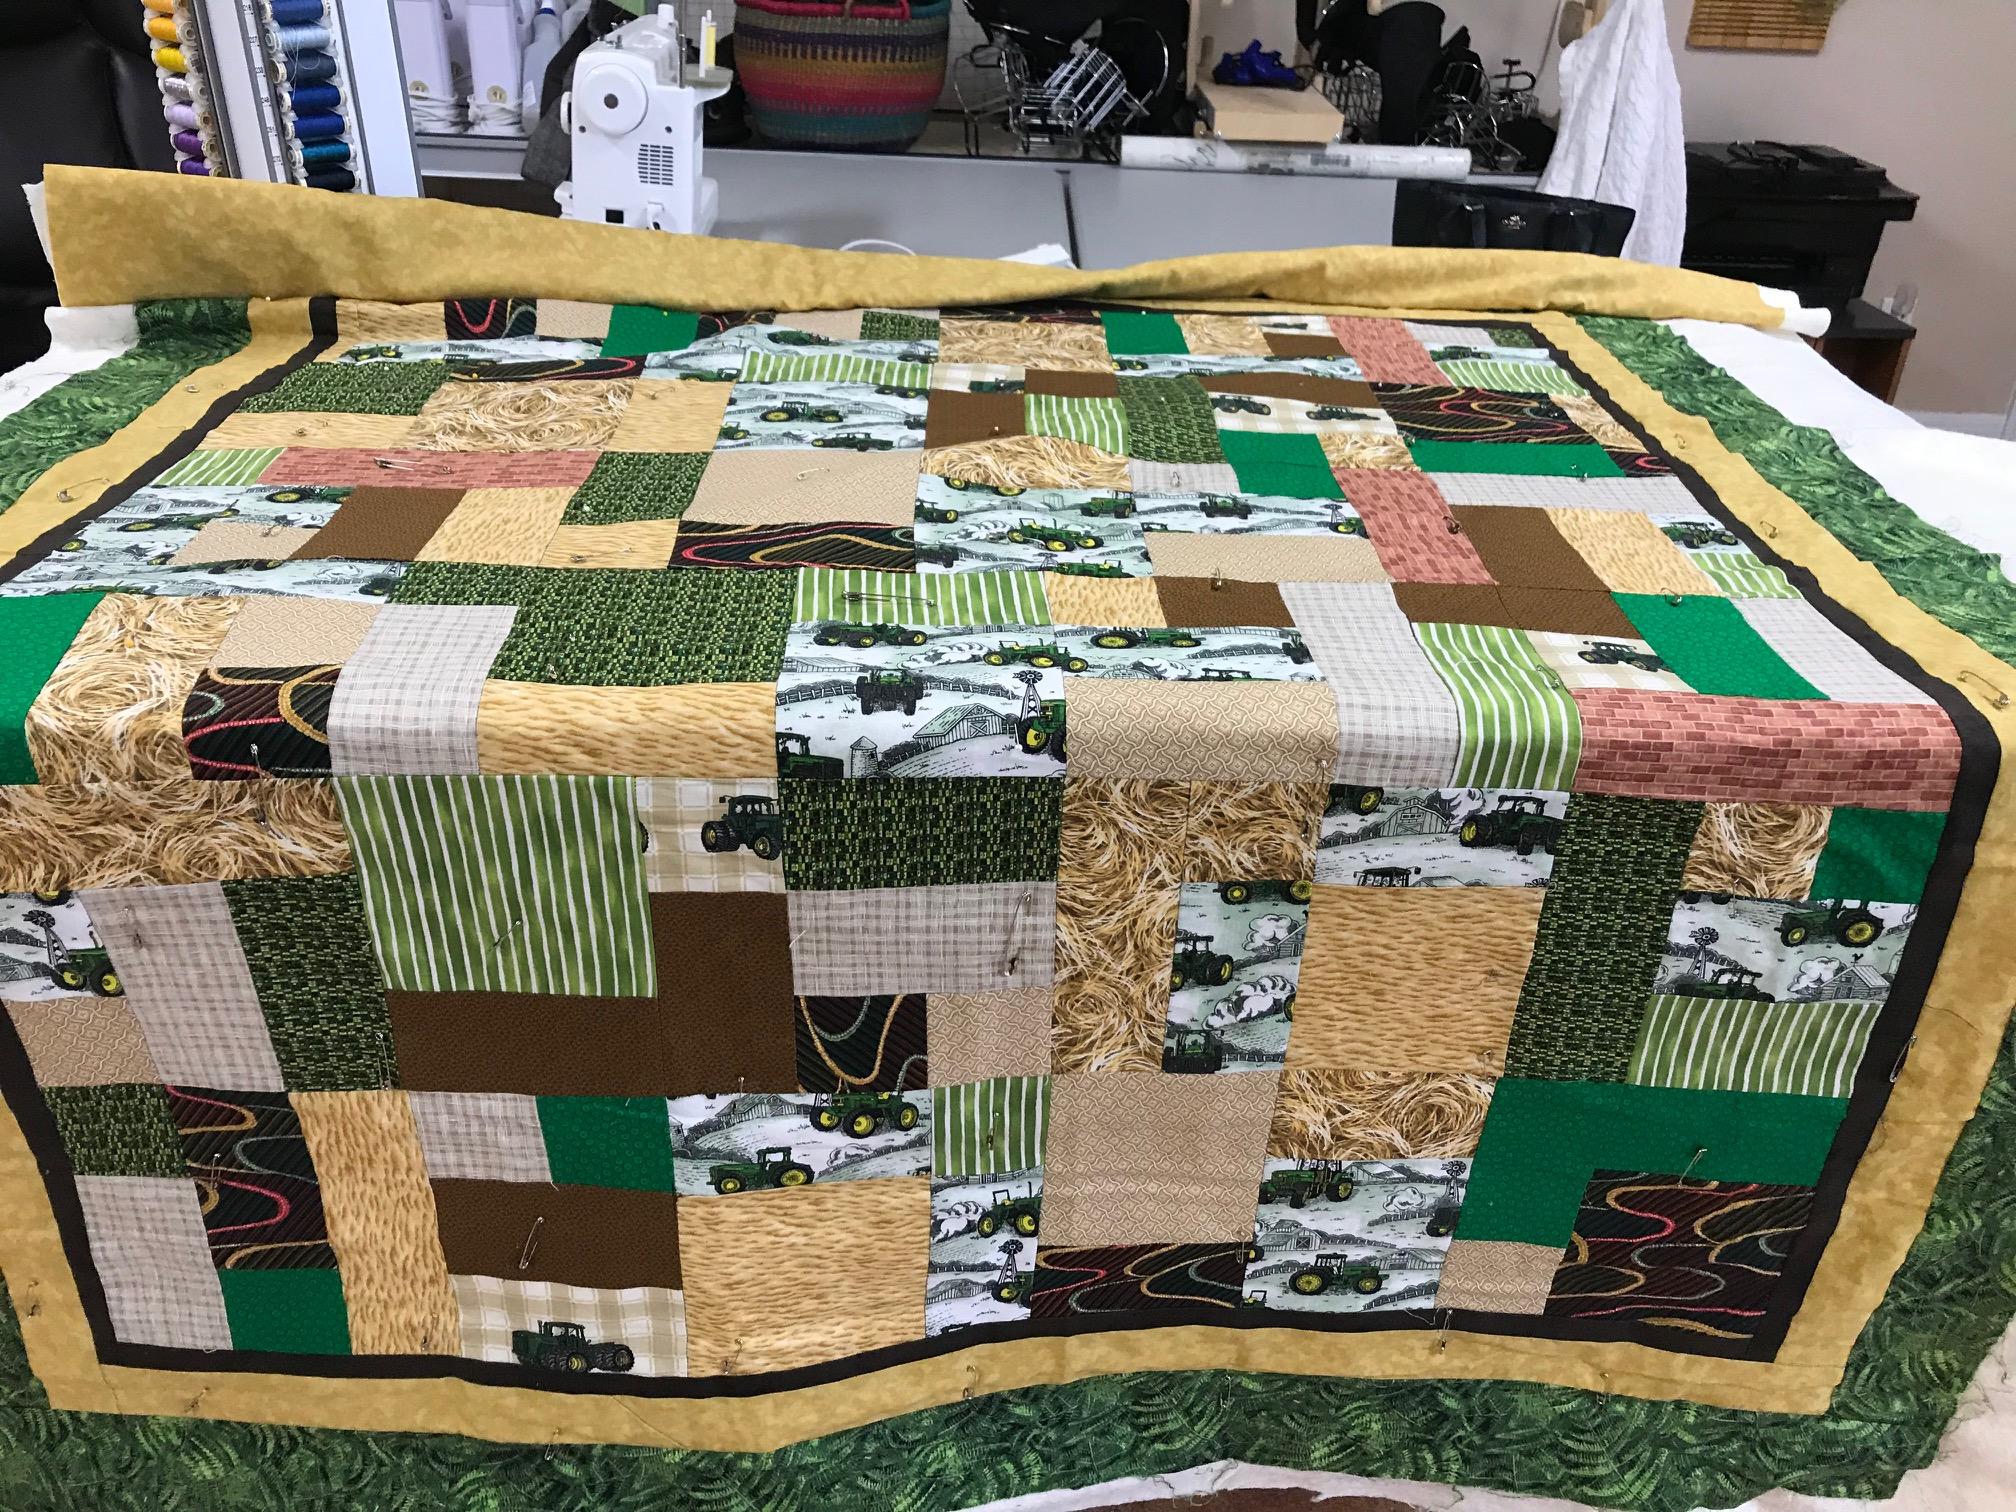 Need Advice On Quilt Design For John Deere Quilt